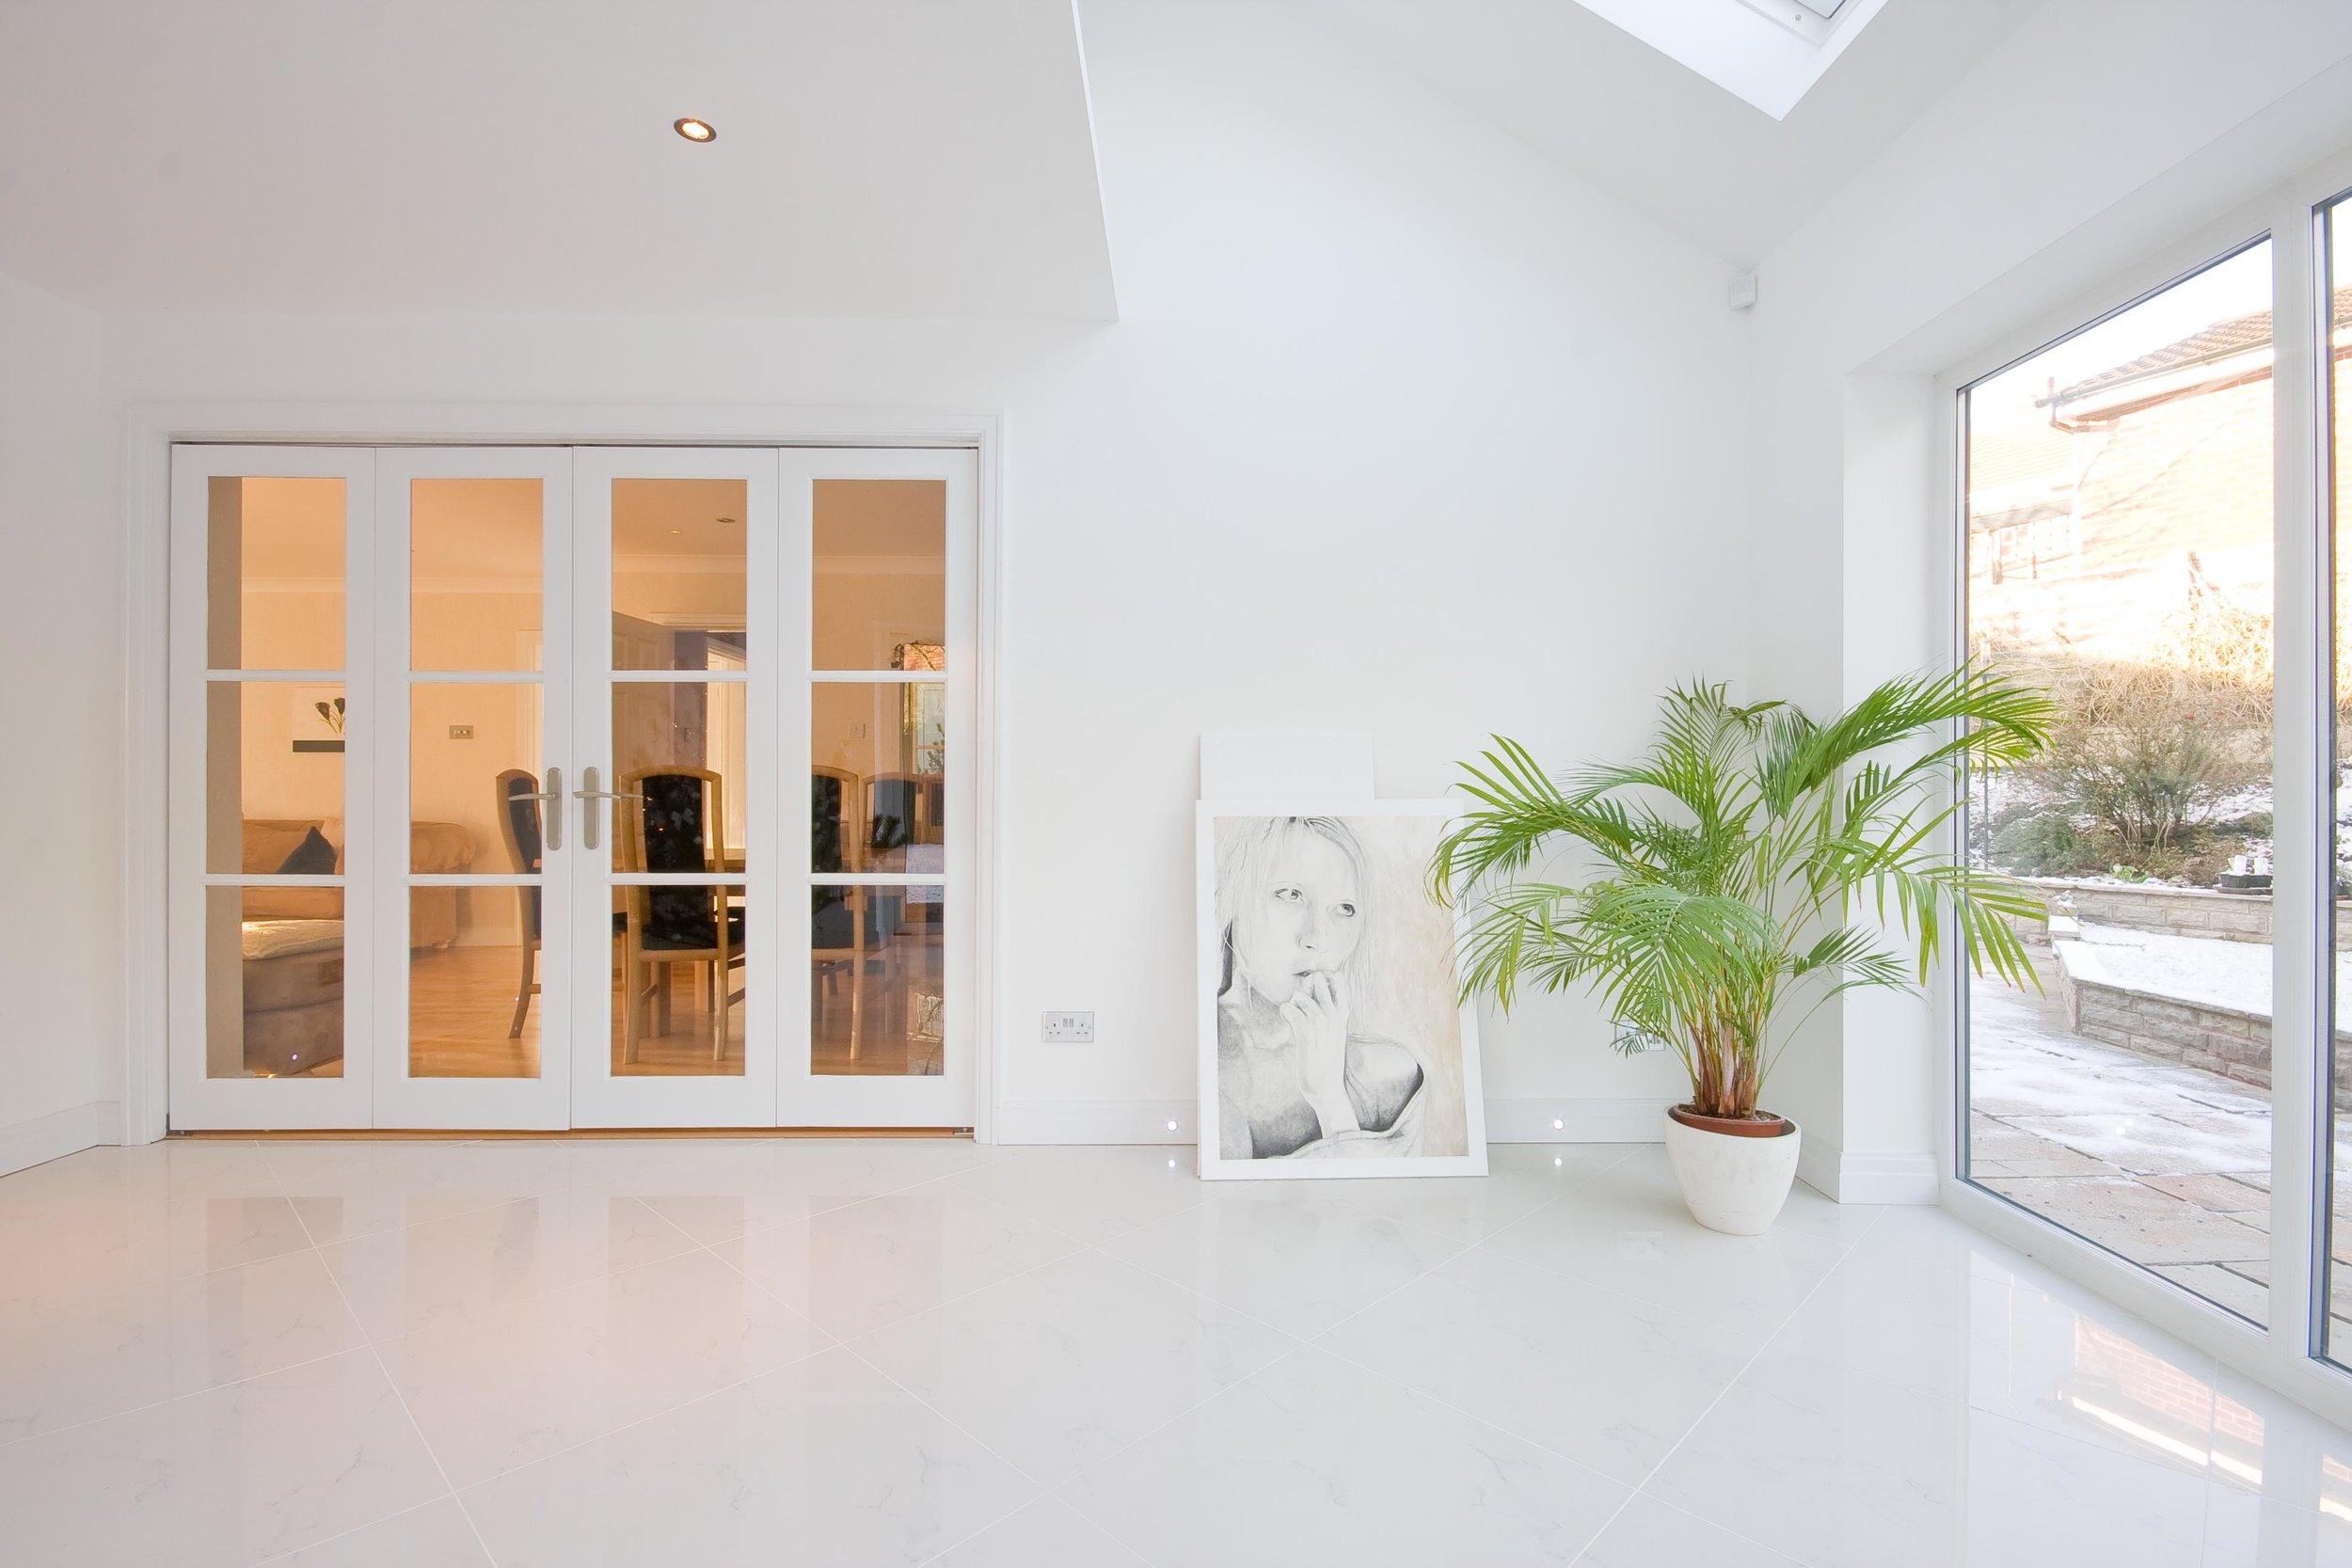 PropertyPhotographs-4529.jpg